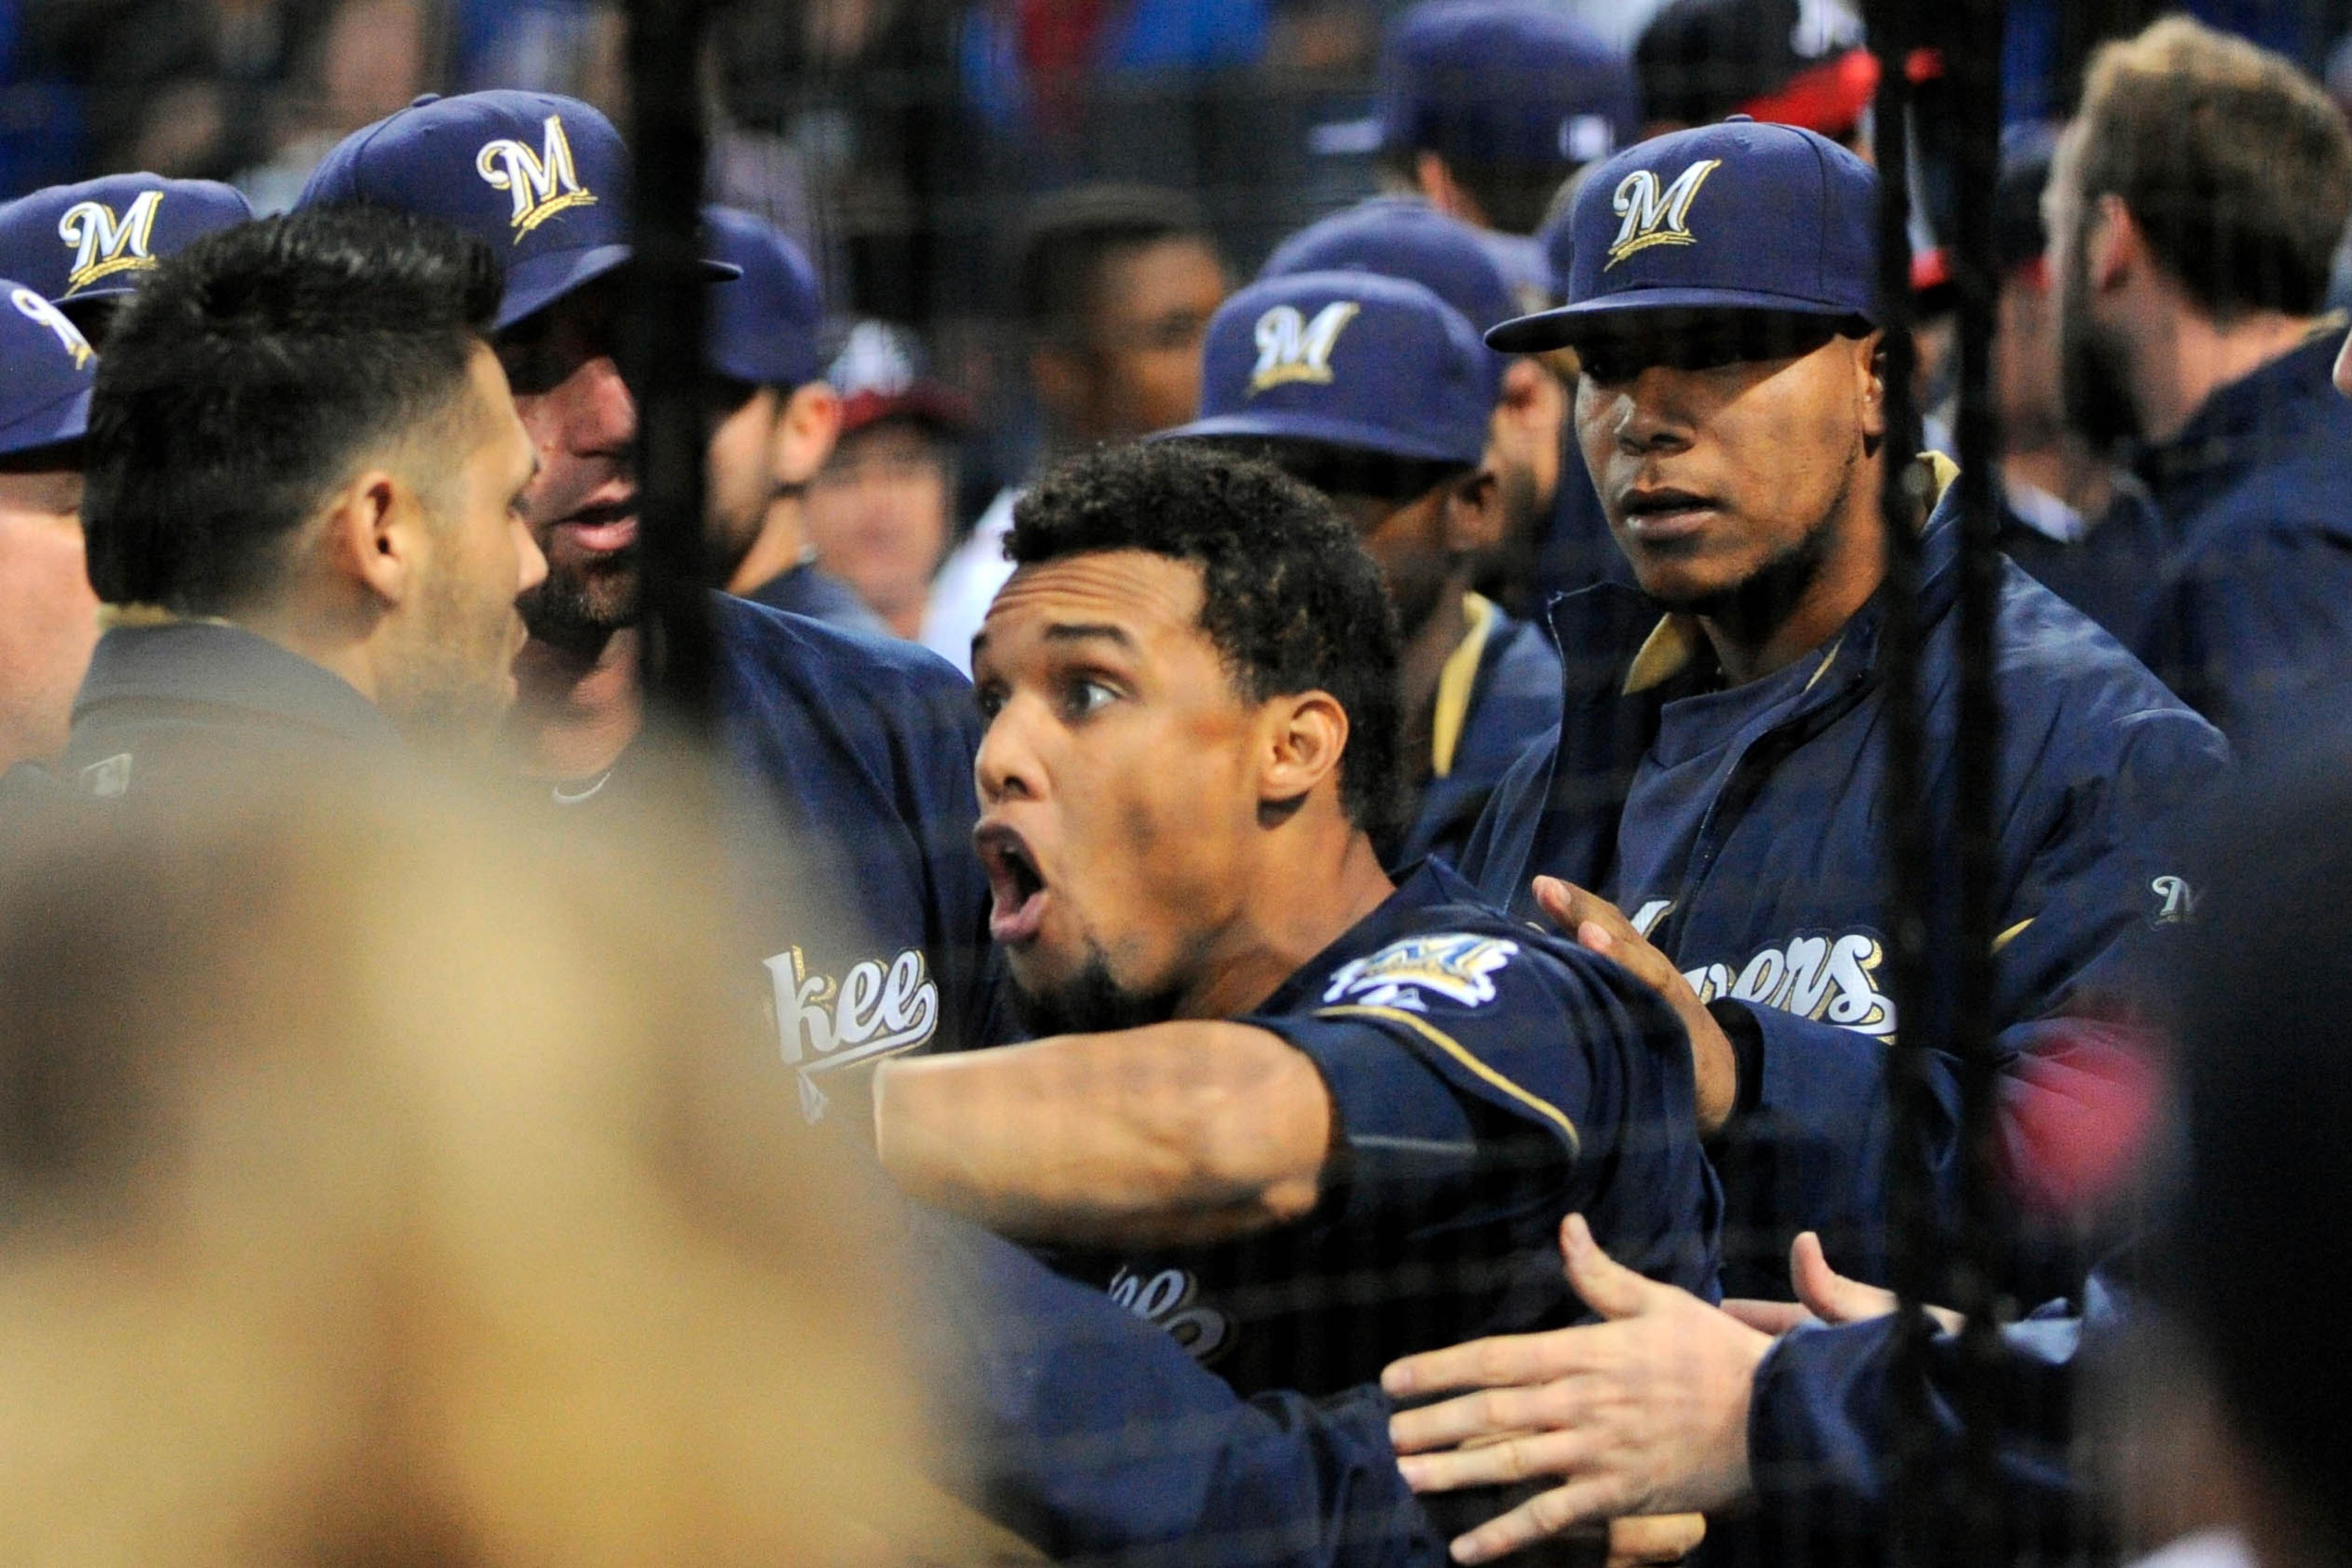 Carlos Gomez apologizes for 'unacceptable' behavior